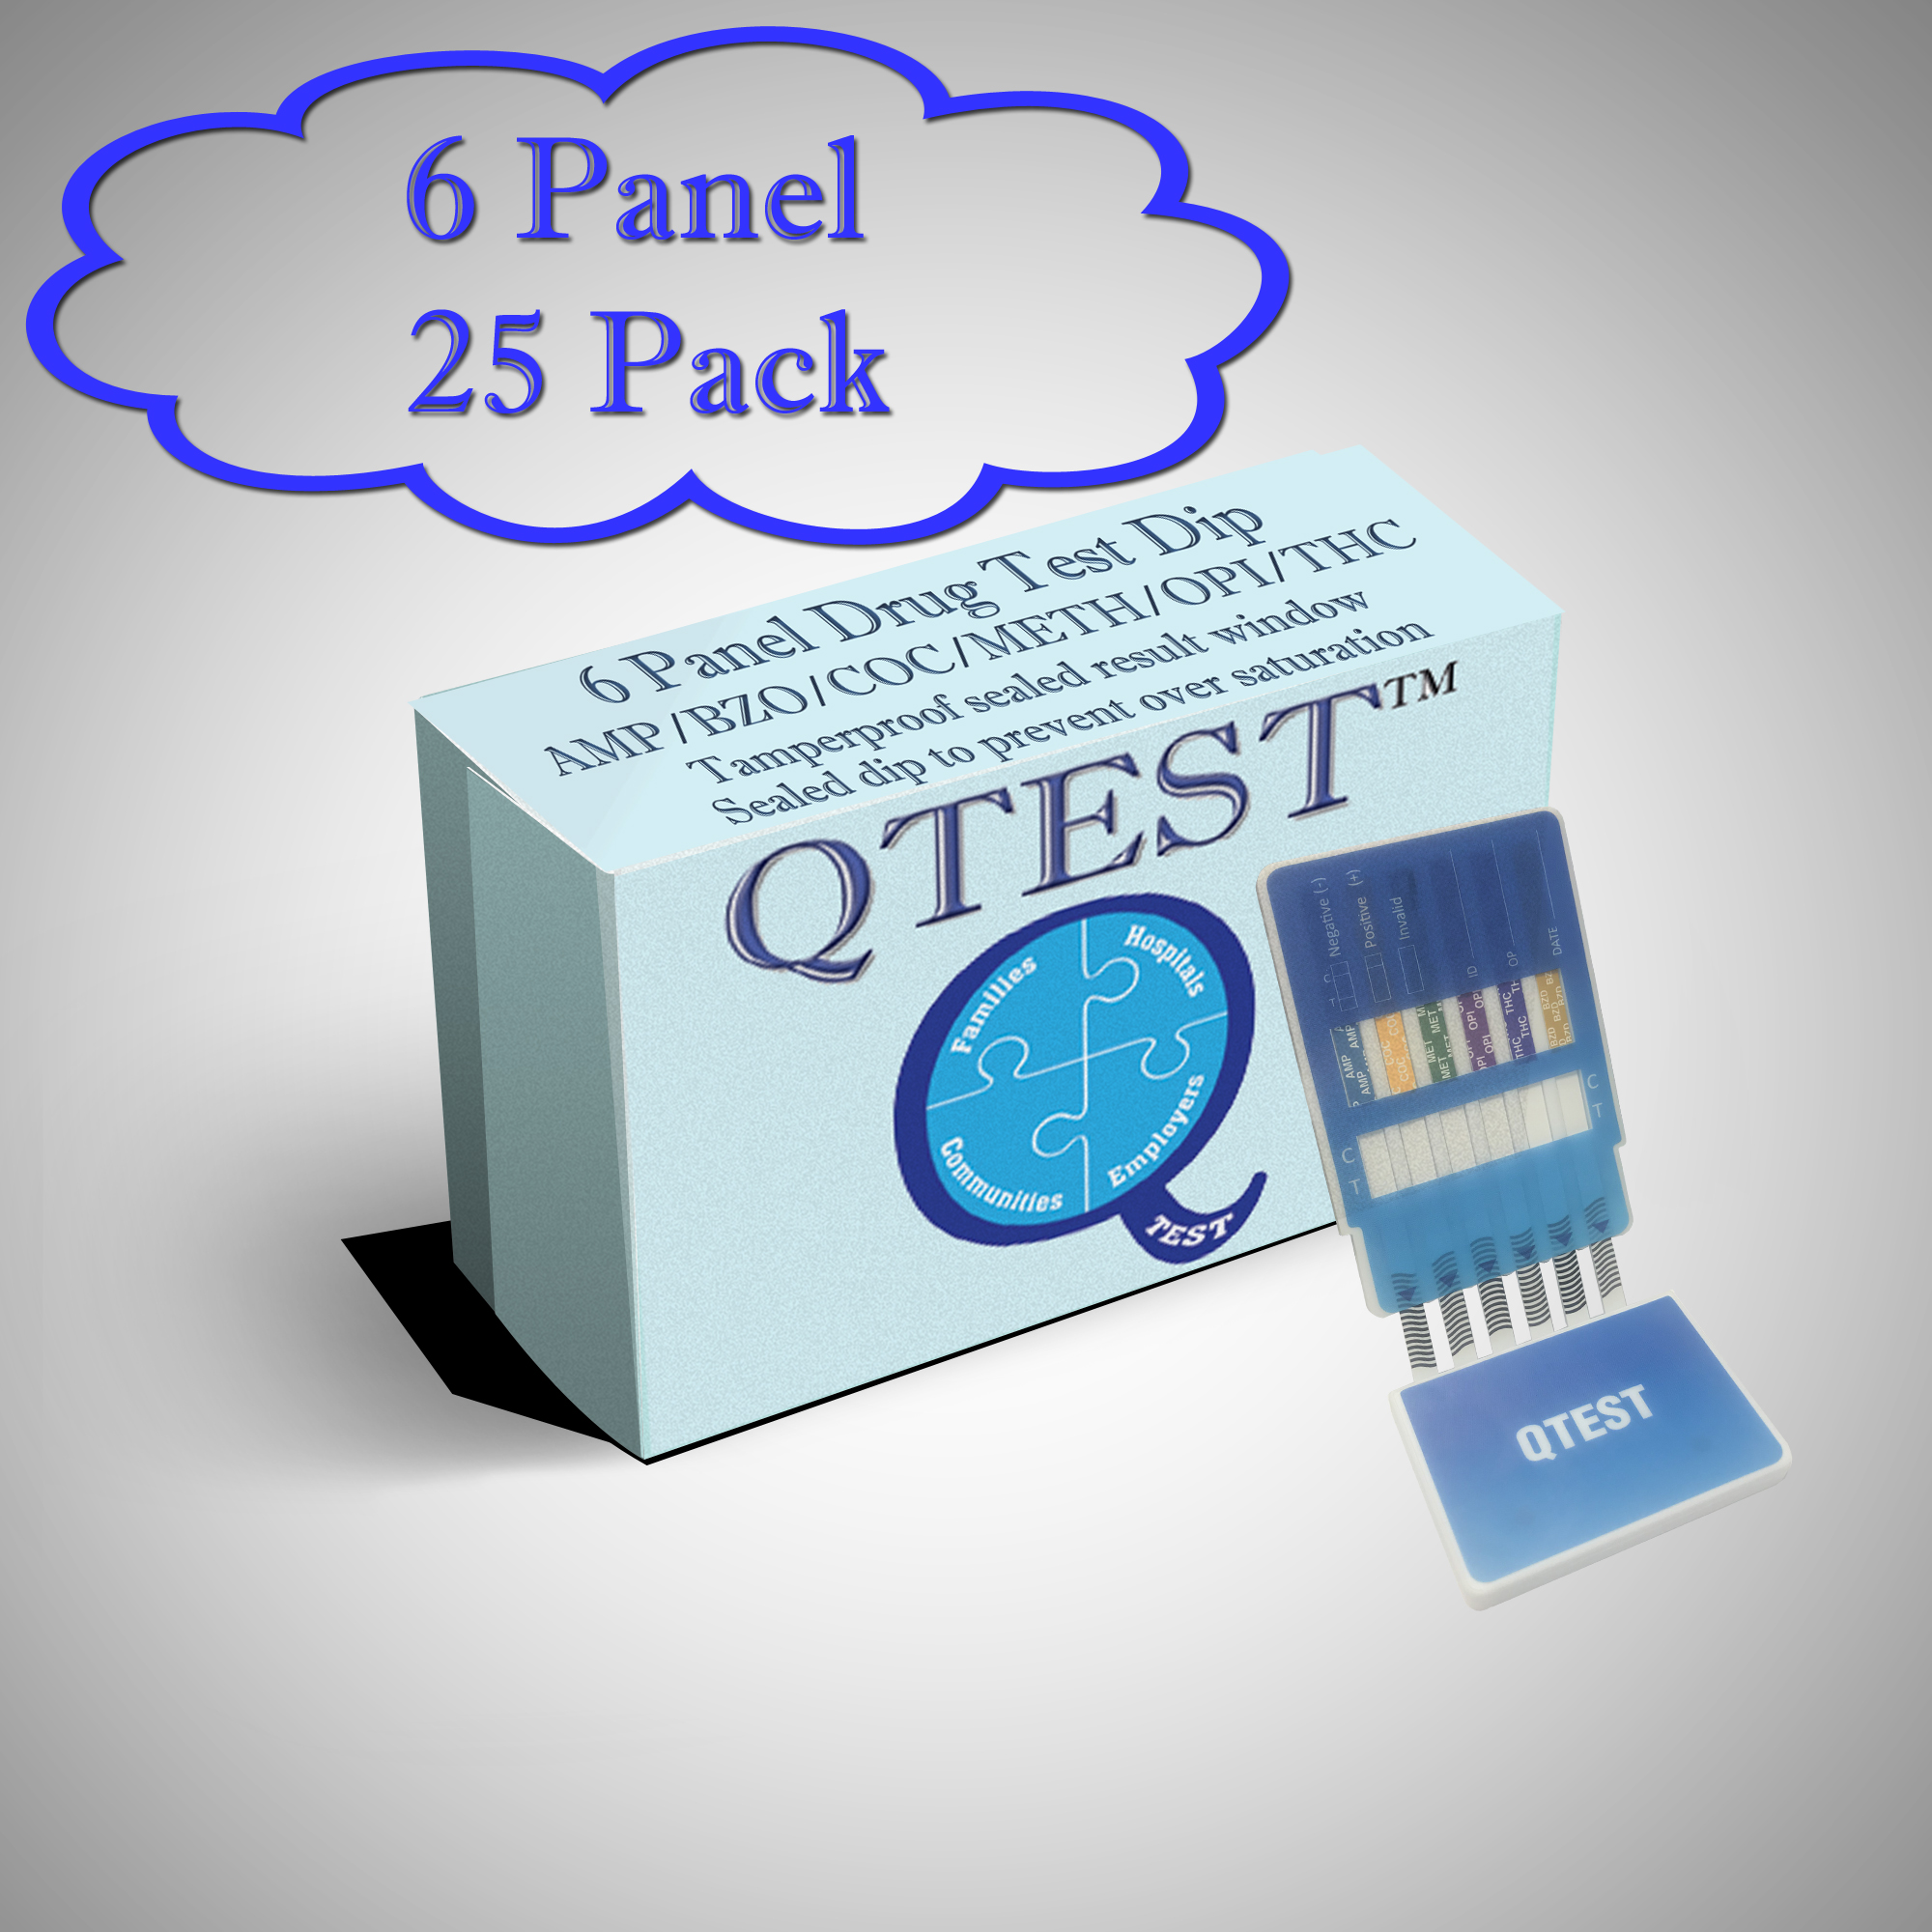 (25 Pack) QTEST 6 Panel Urine Drug Test Dip Tamper Proof - Amp (Amphetamine), Bzo (Benzodiazepine), Coc (Cocaine), Mamp (Methamphetamine, Opi (Opiates), Thc (Marijuana)